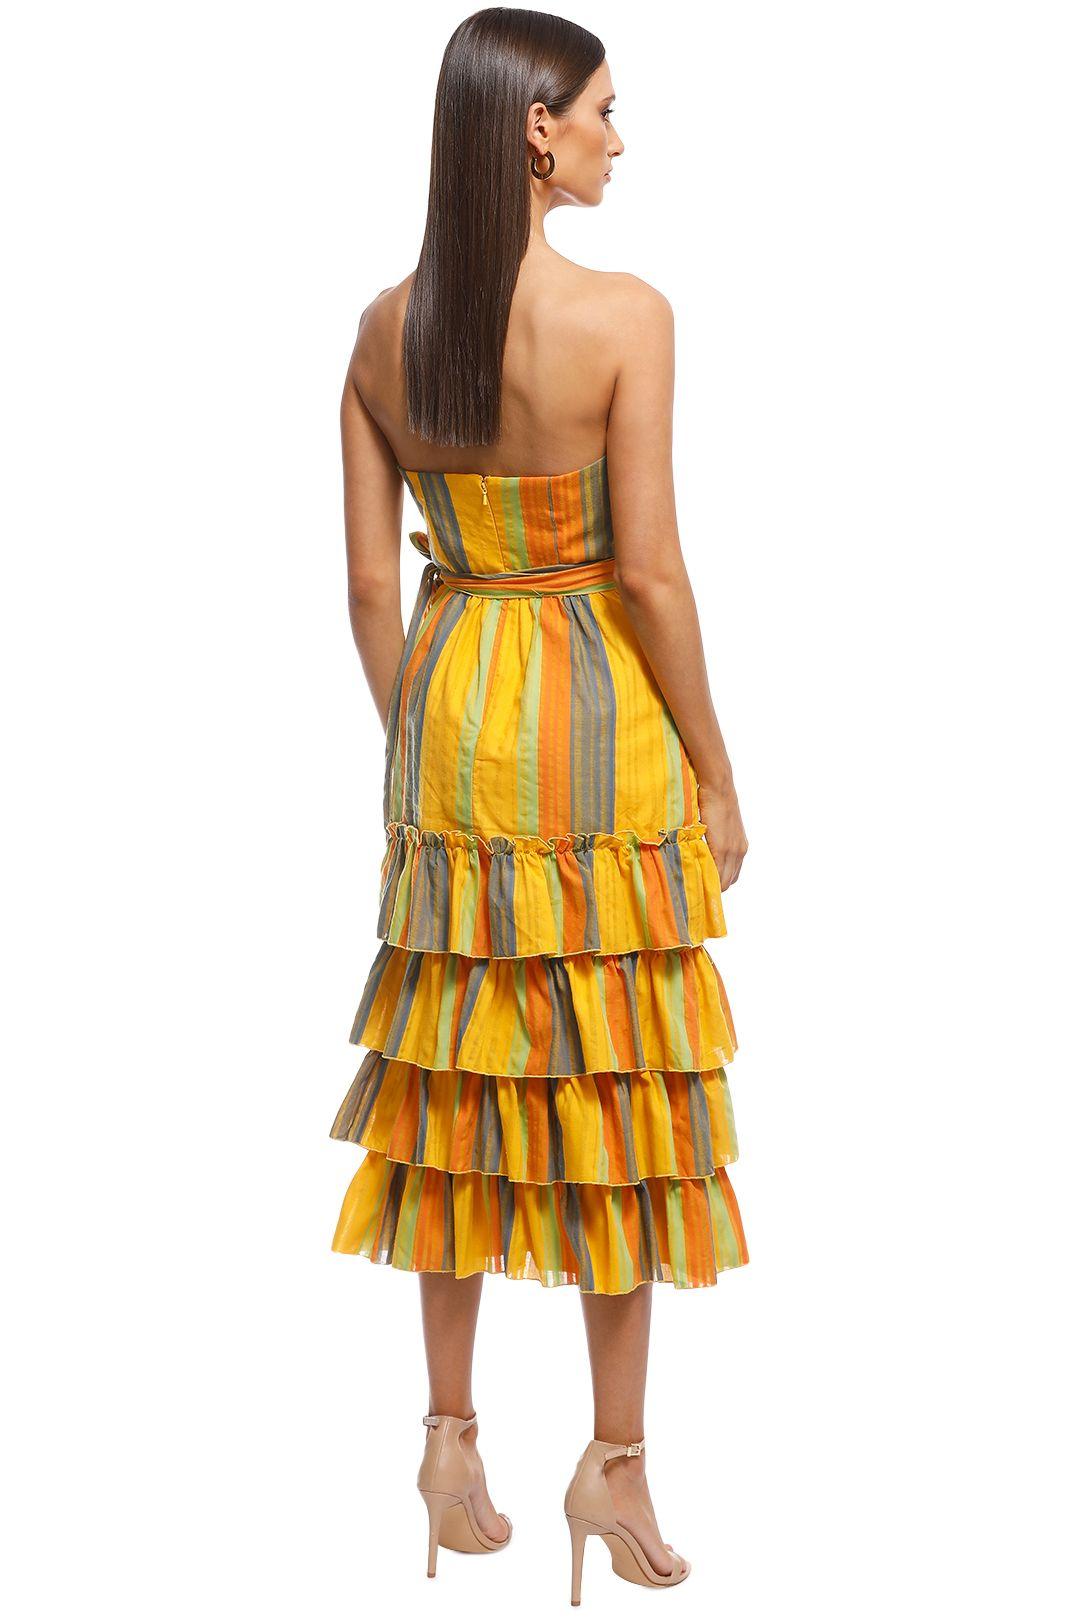 Talulah - Imperial Midi Dress - Yellow Stripes - Back